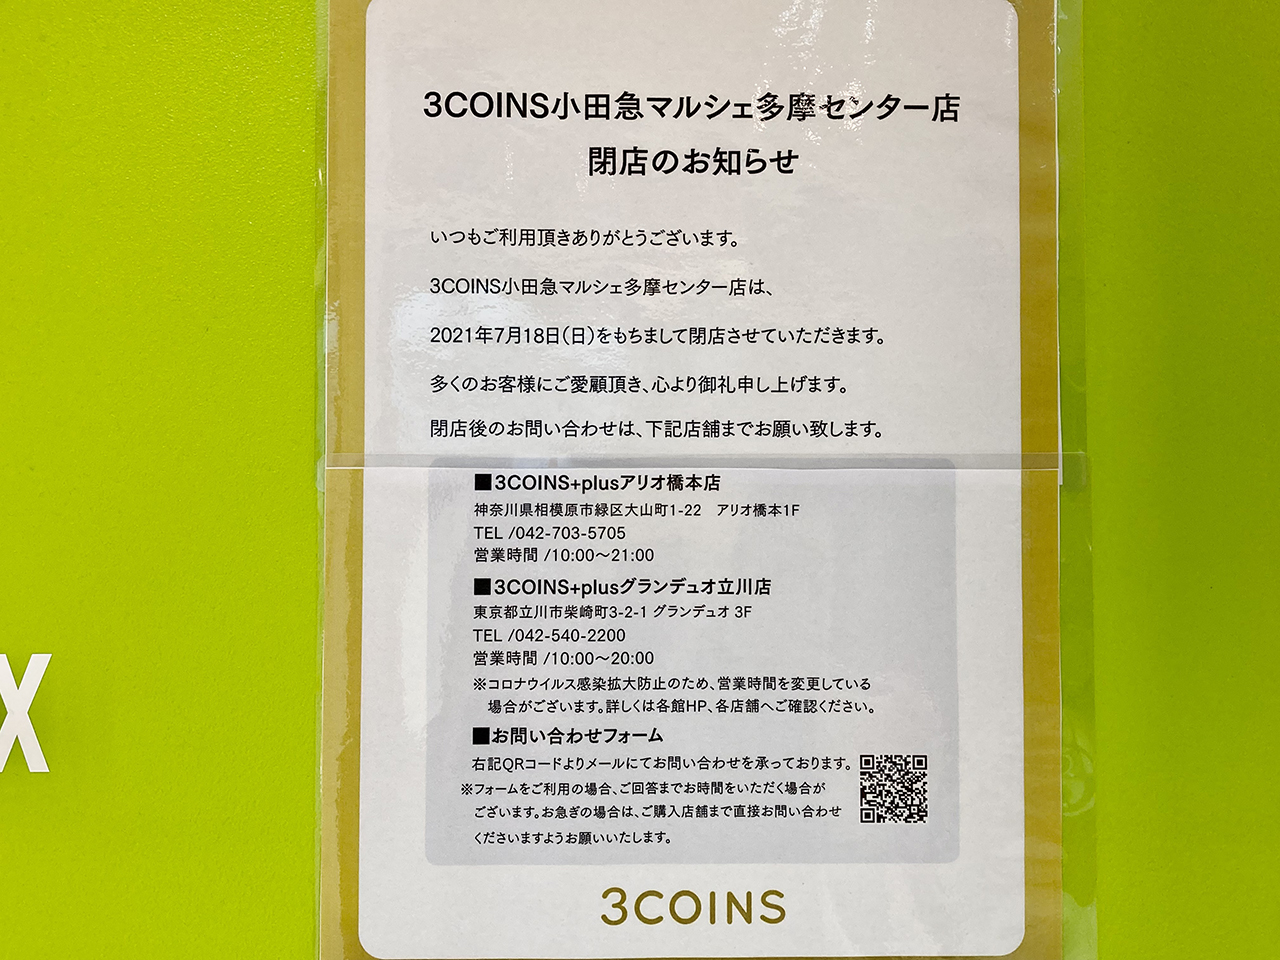 3COINS(スリーコインズ)小田急マルシェ多摩センター